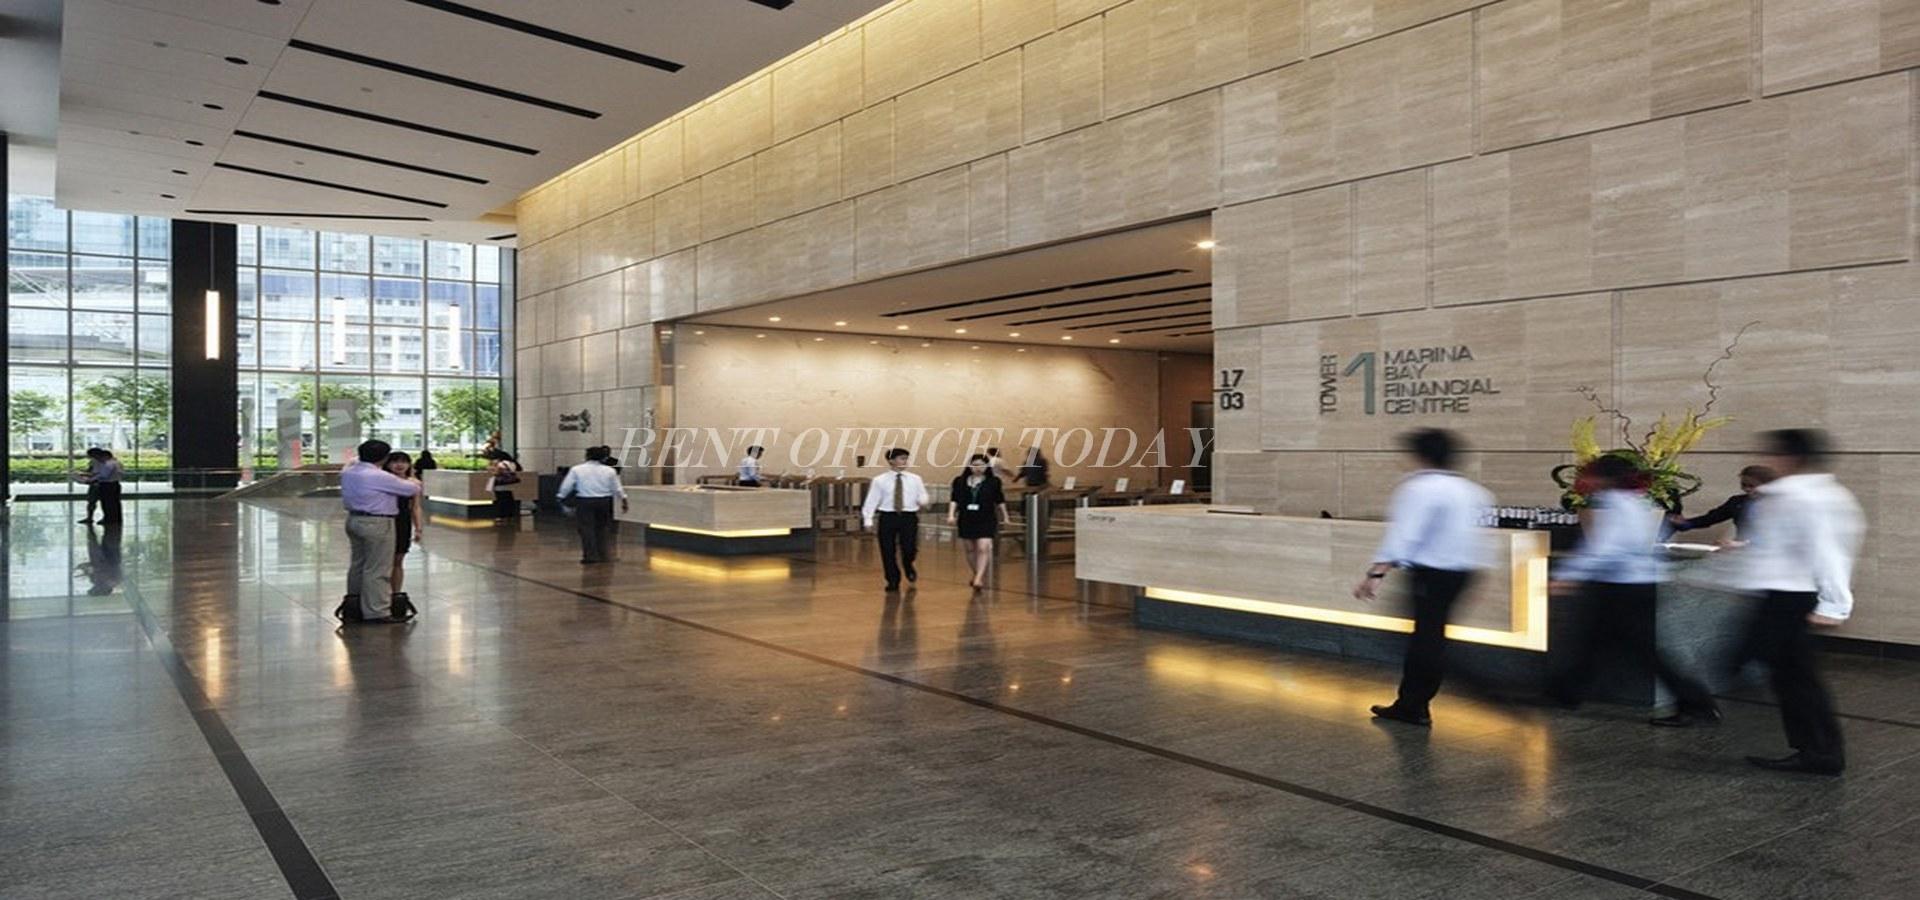 бизнес центр marina bay financial centre-11